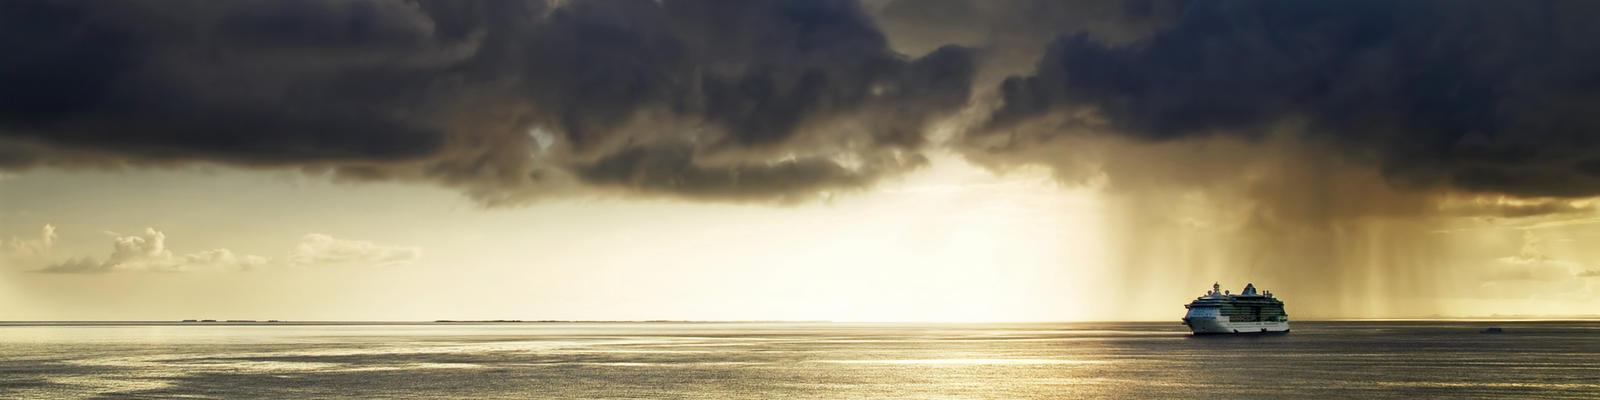 Cyclone Season Cruising (Photo: 7489248533/Shutterstock.com)